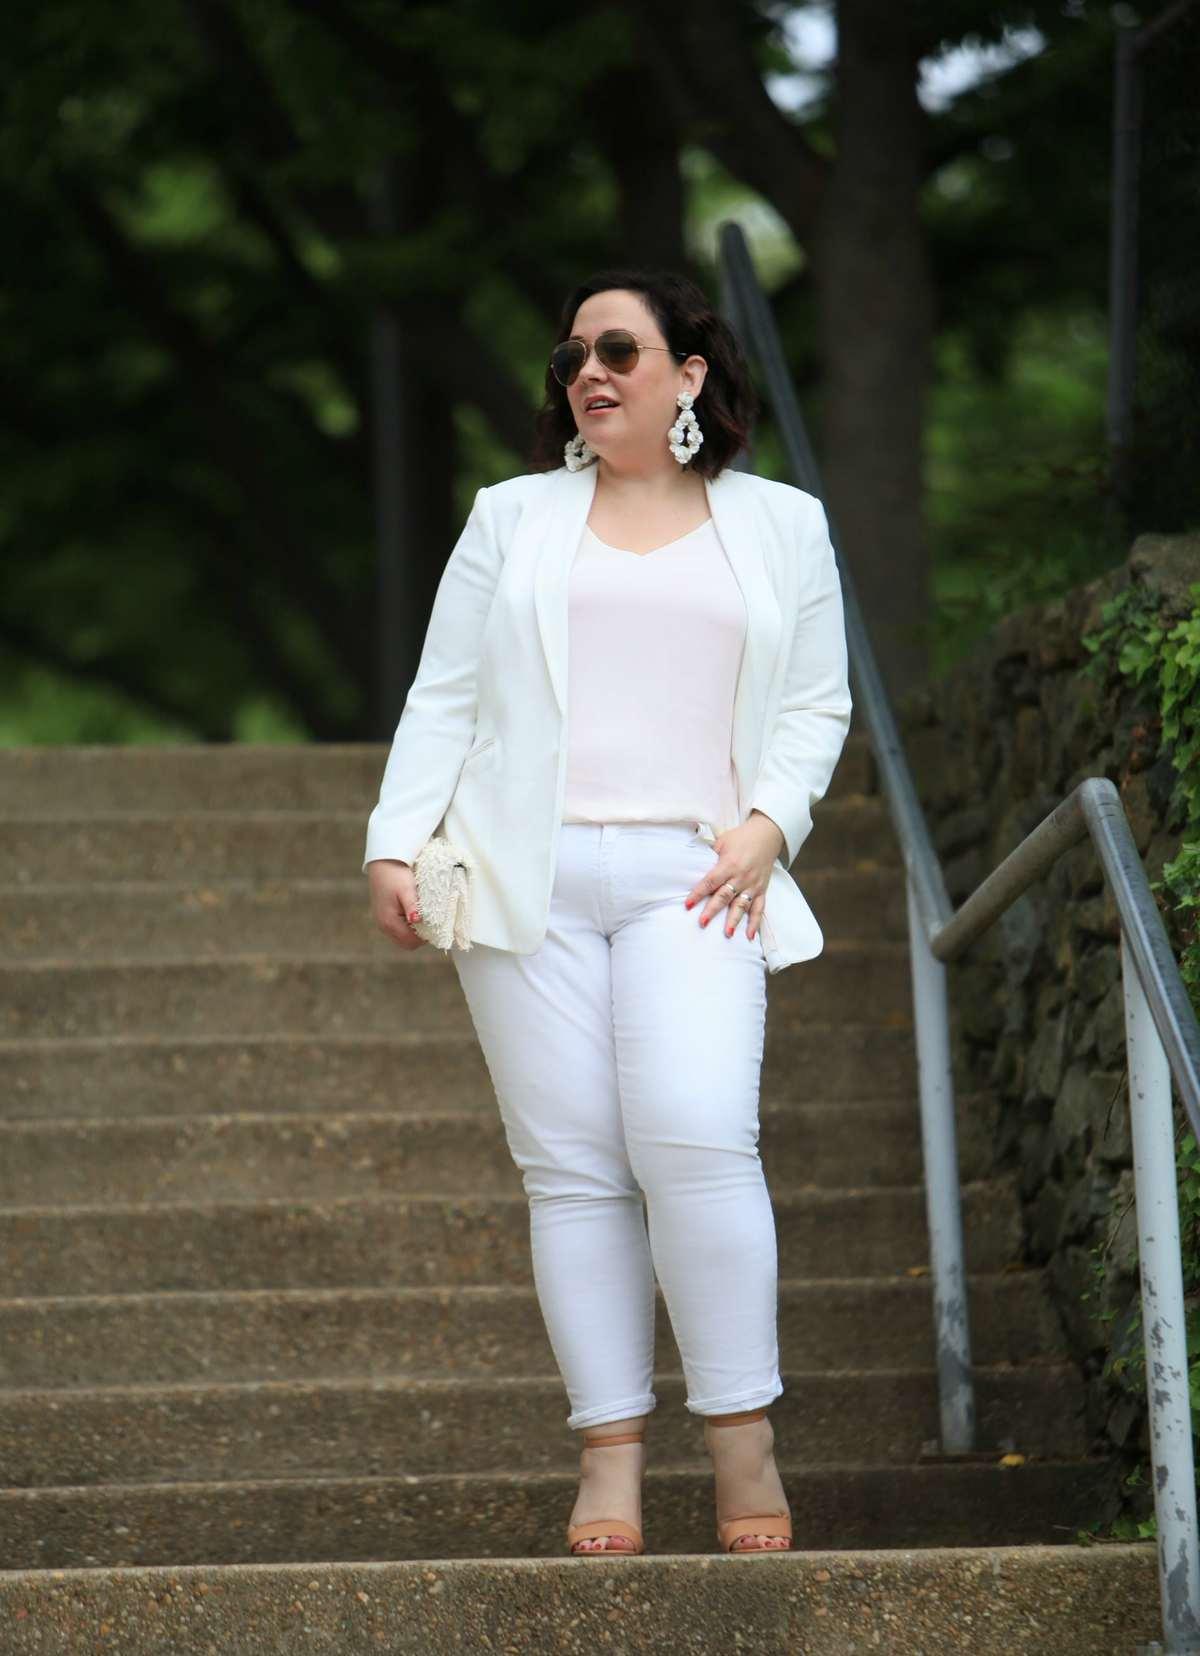 Wardrobe Oxygen in Vince Camuto blazer, LOFT strappy cami, Gap girlfriend jeans and Loeffler Randall tab clutch